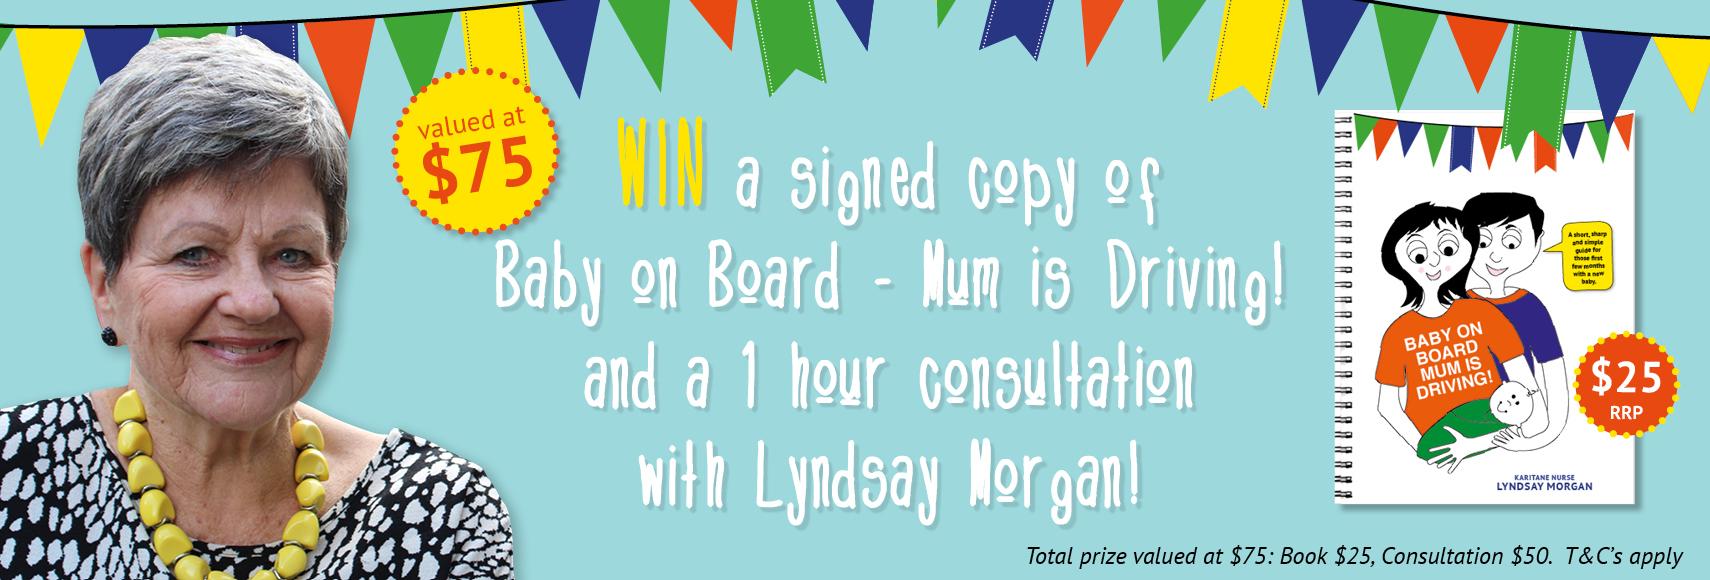 WIN_LyndsayMorgan